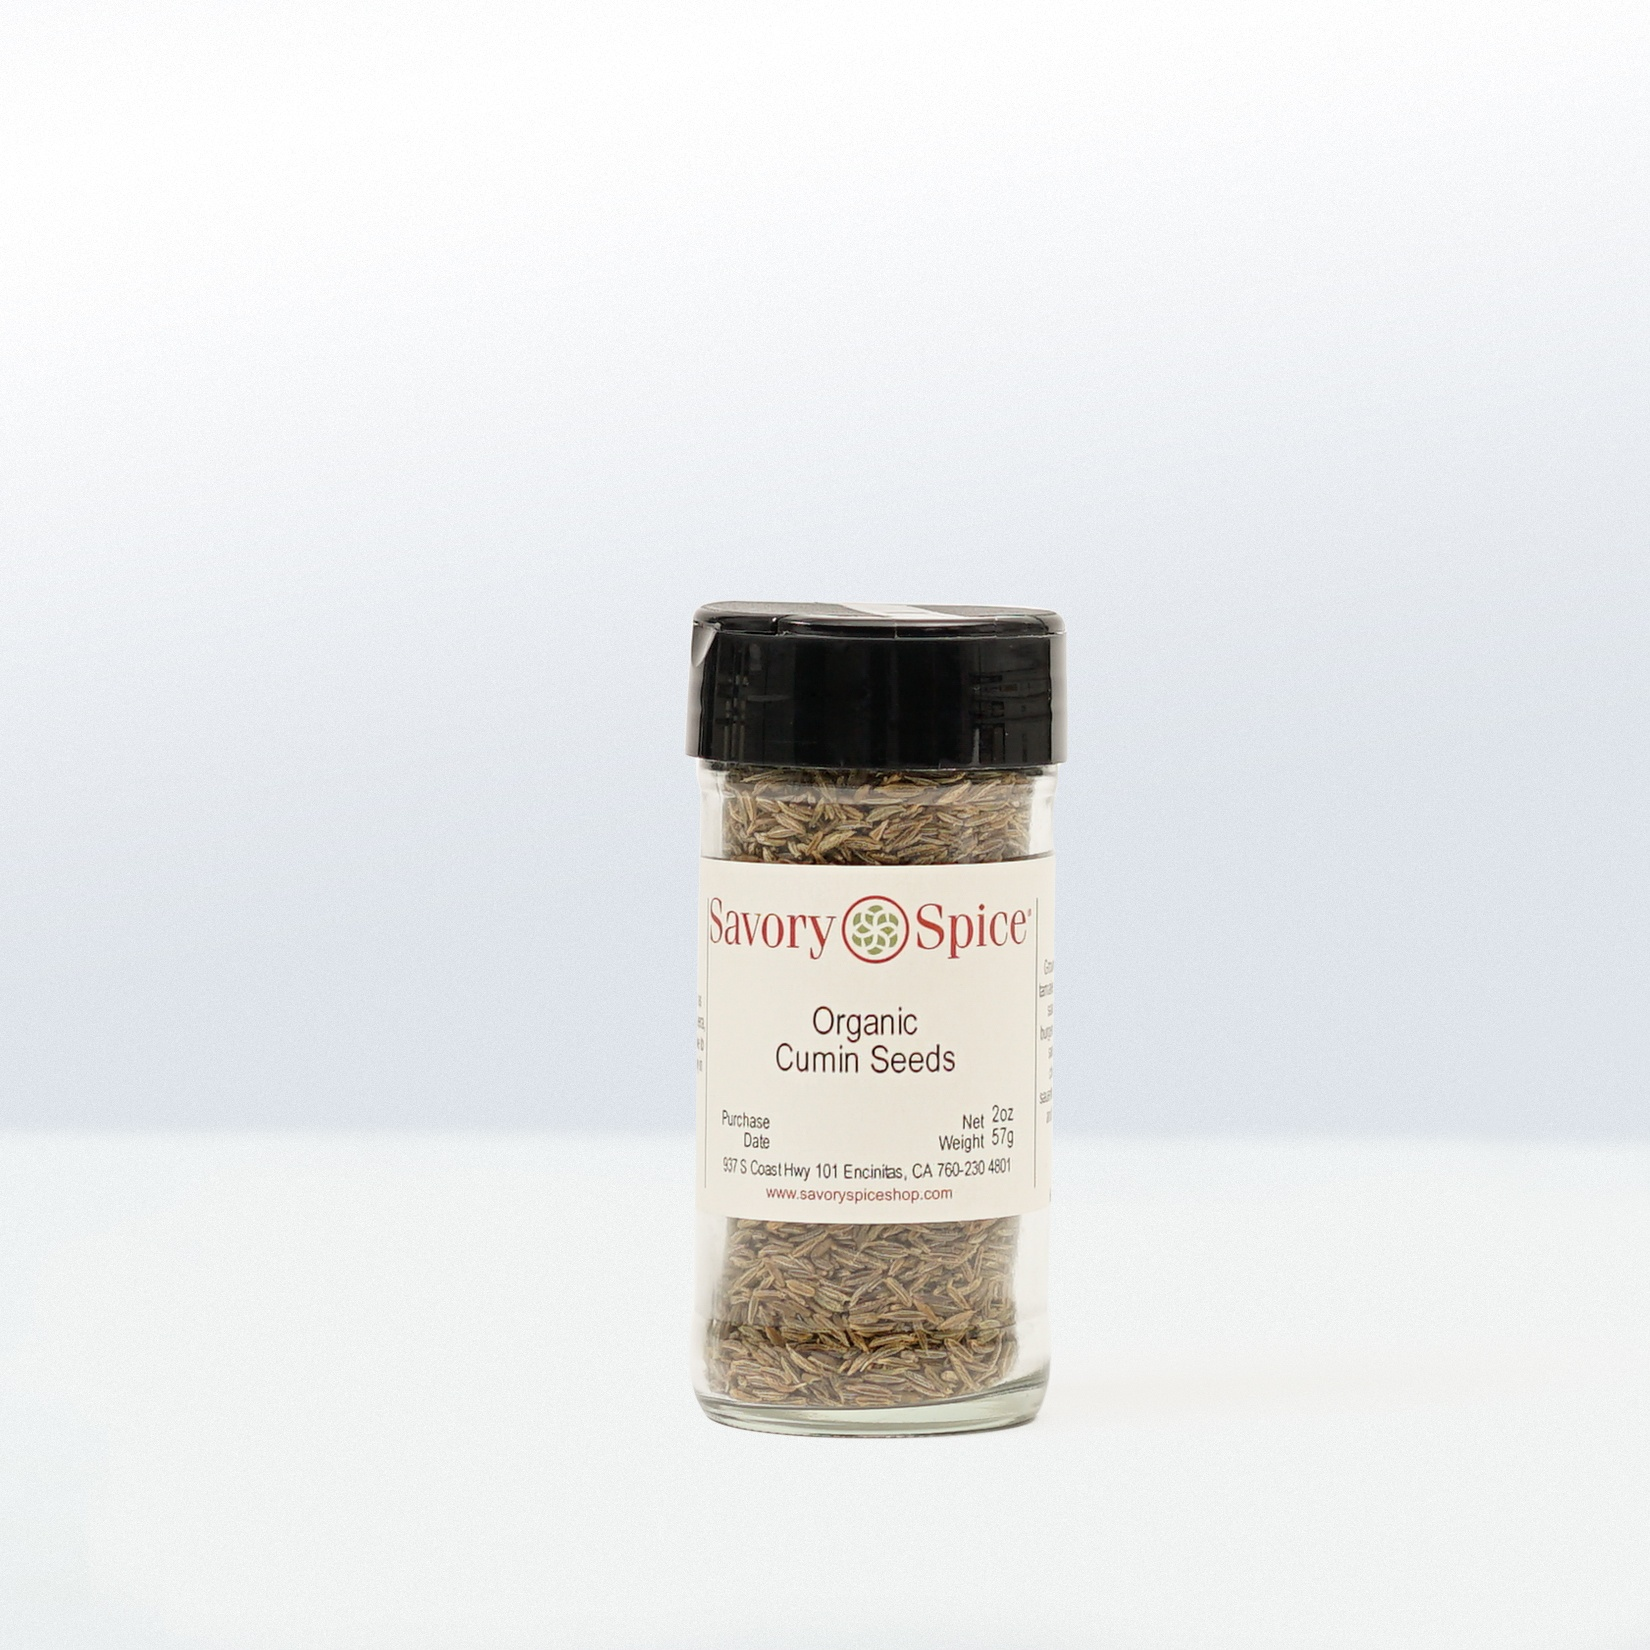 Savory Spice-Organic Cumin Seeds